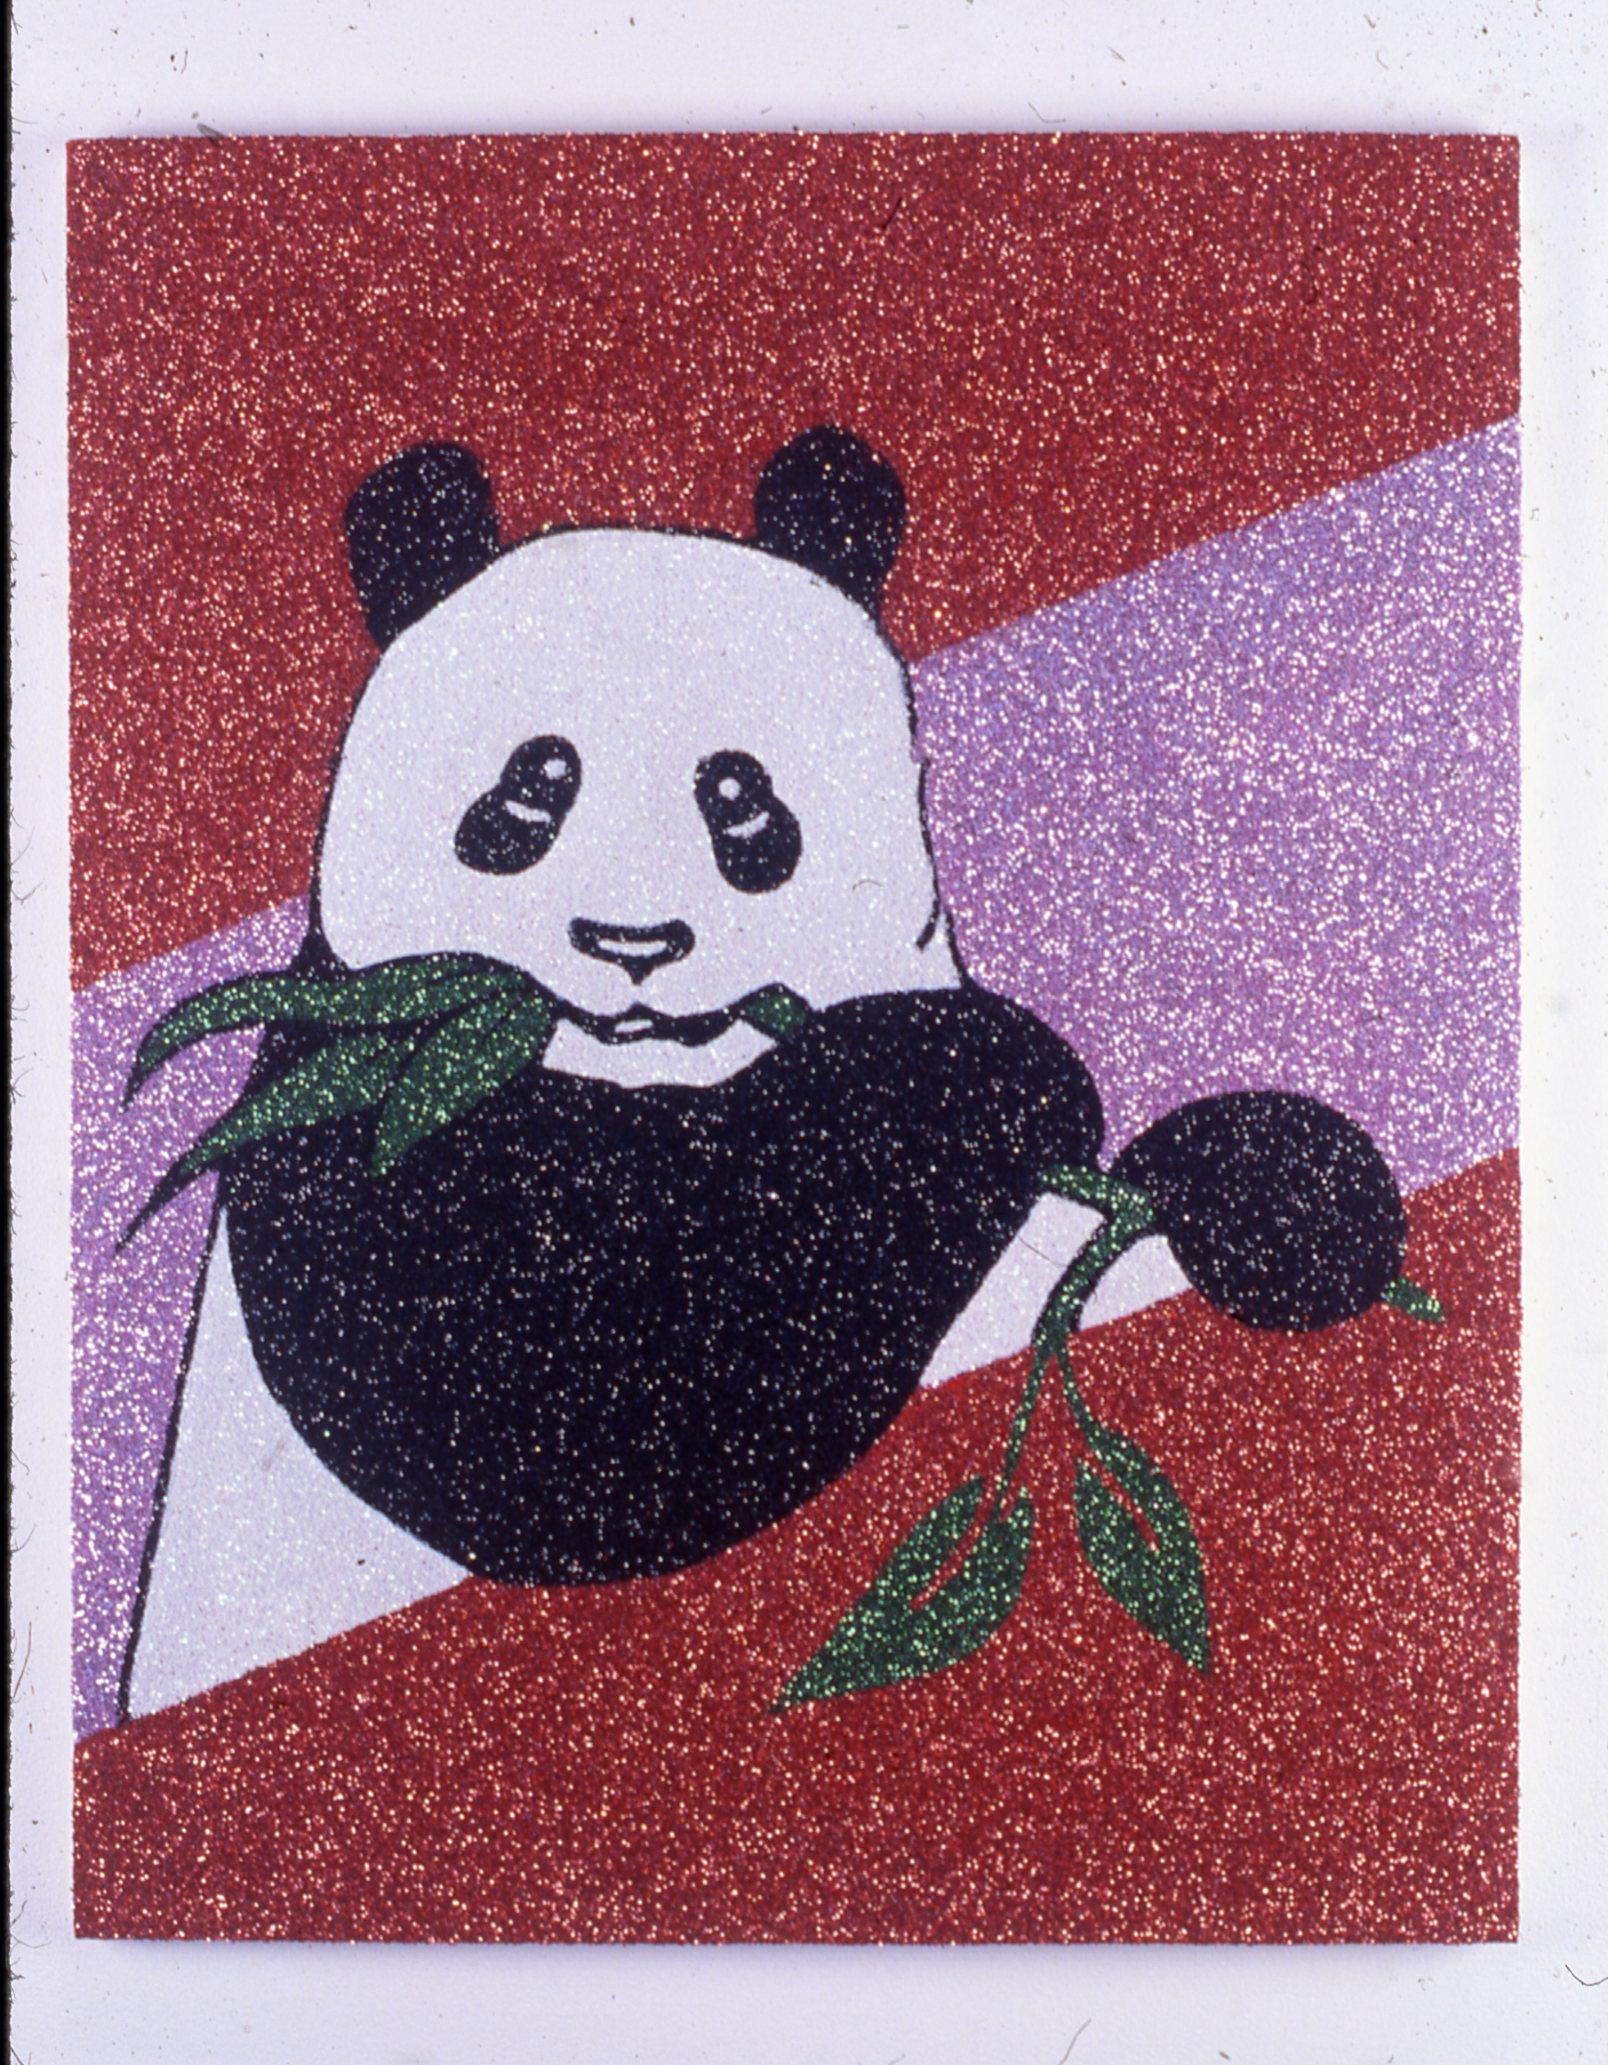 Power of the Panda (Strawberry)